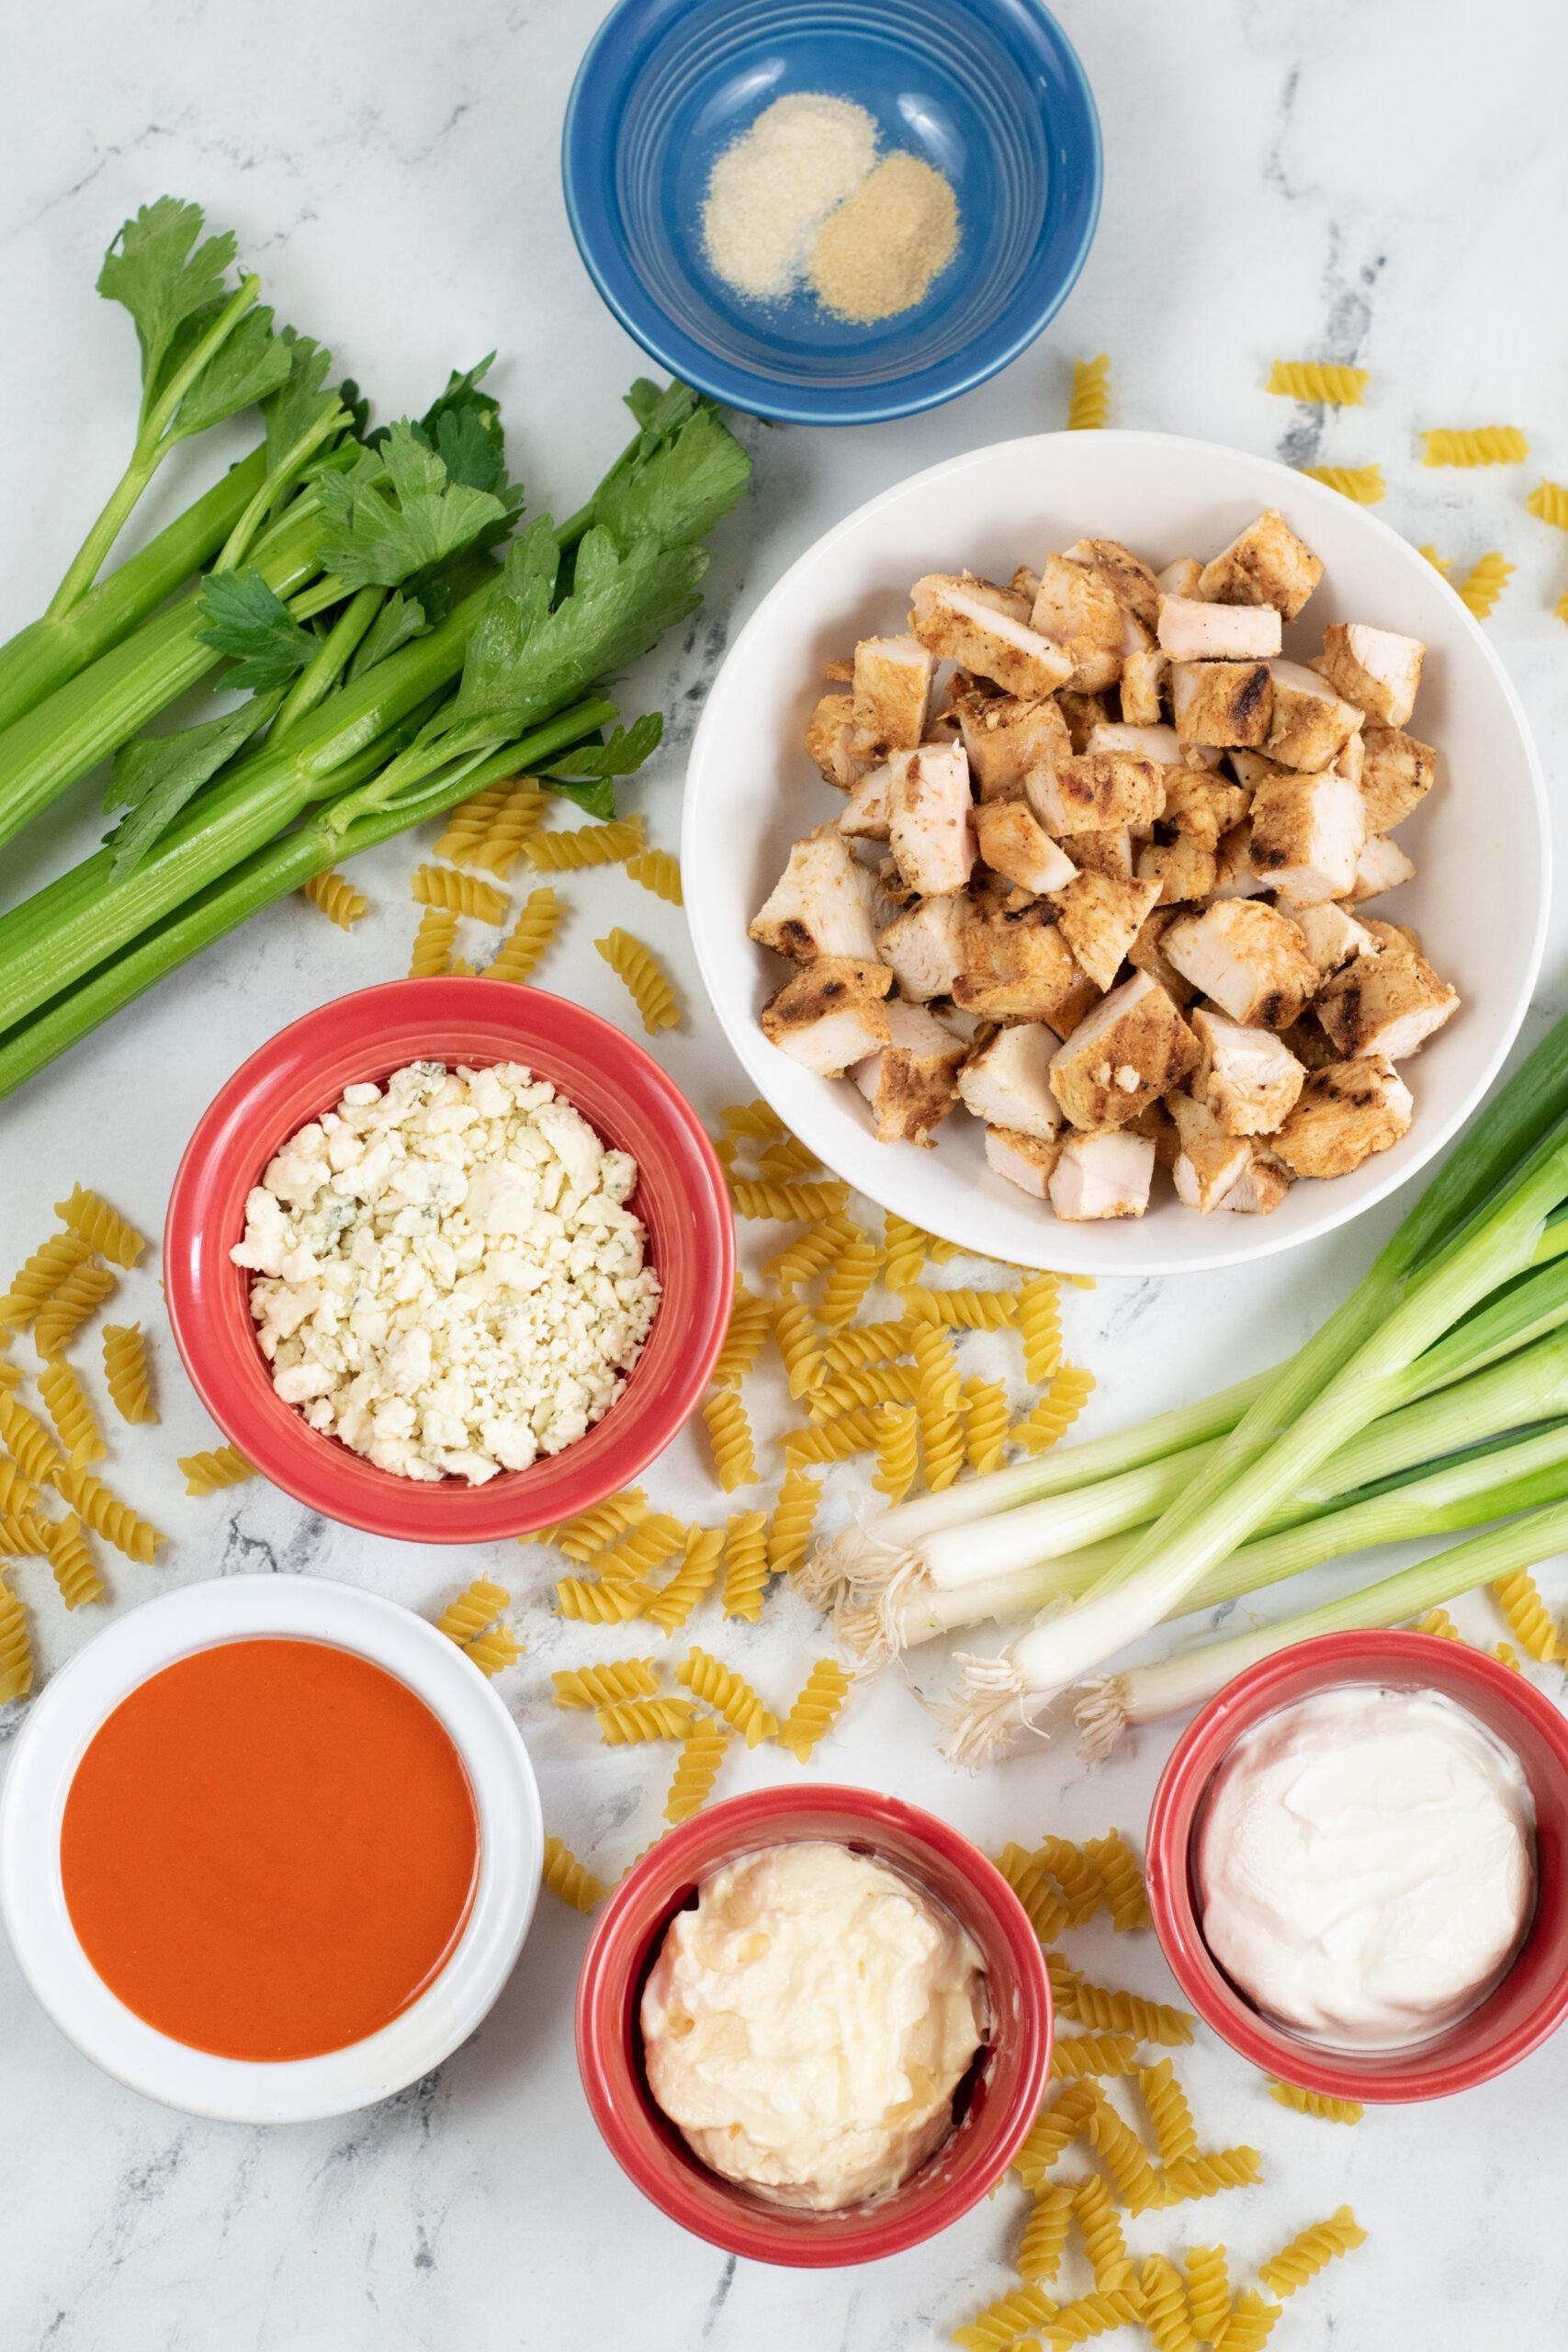 Ingredients for buffalo chicken pasta salad